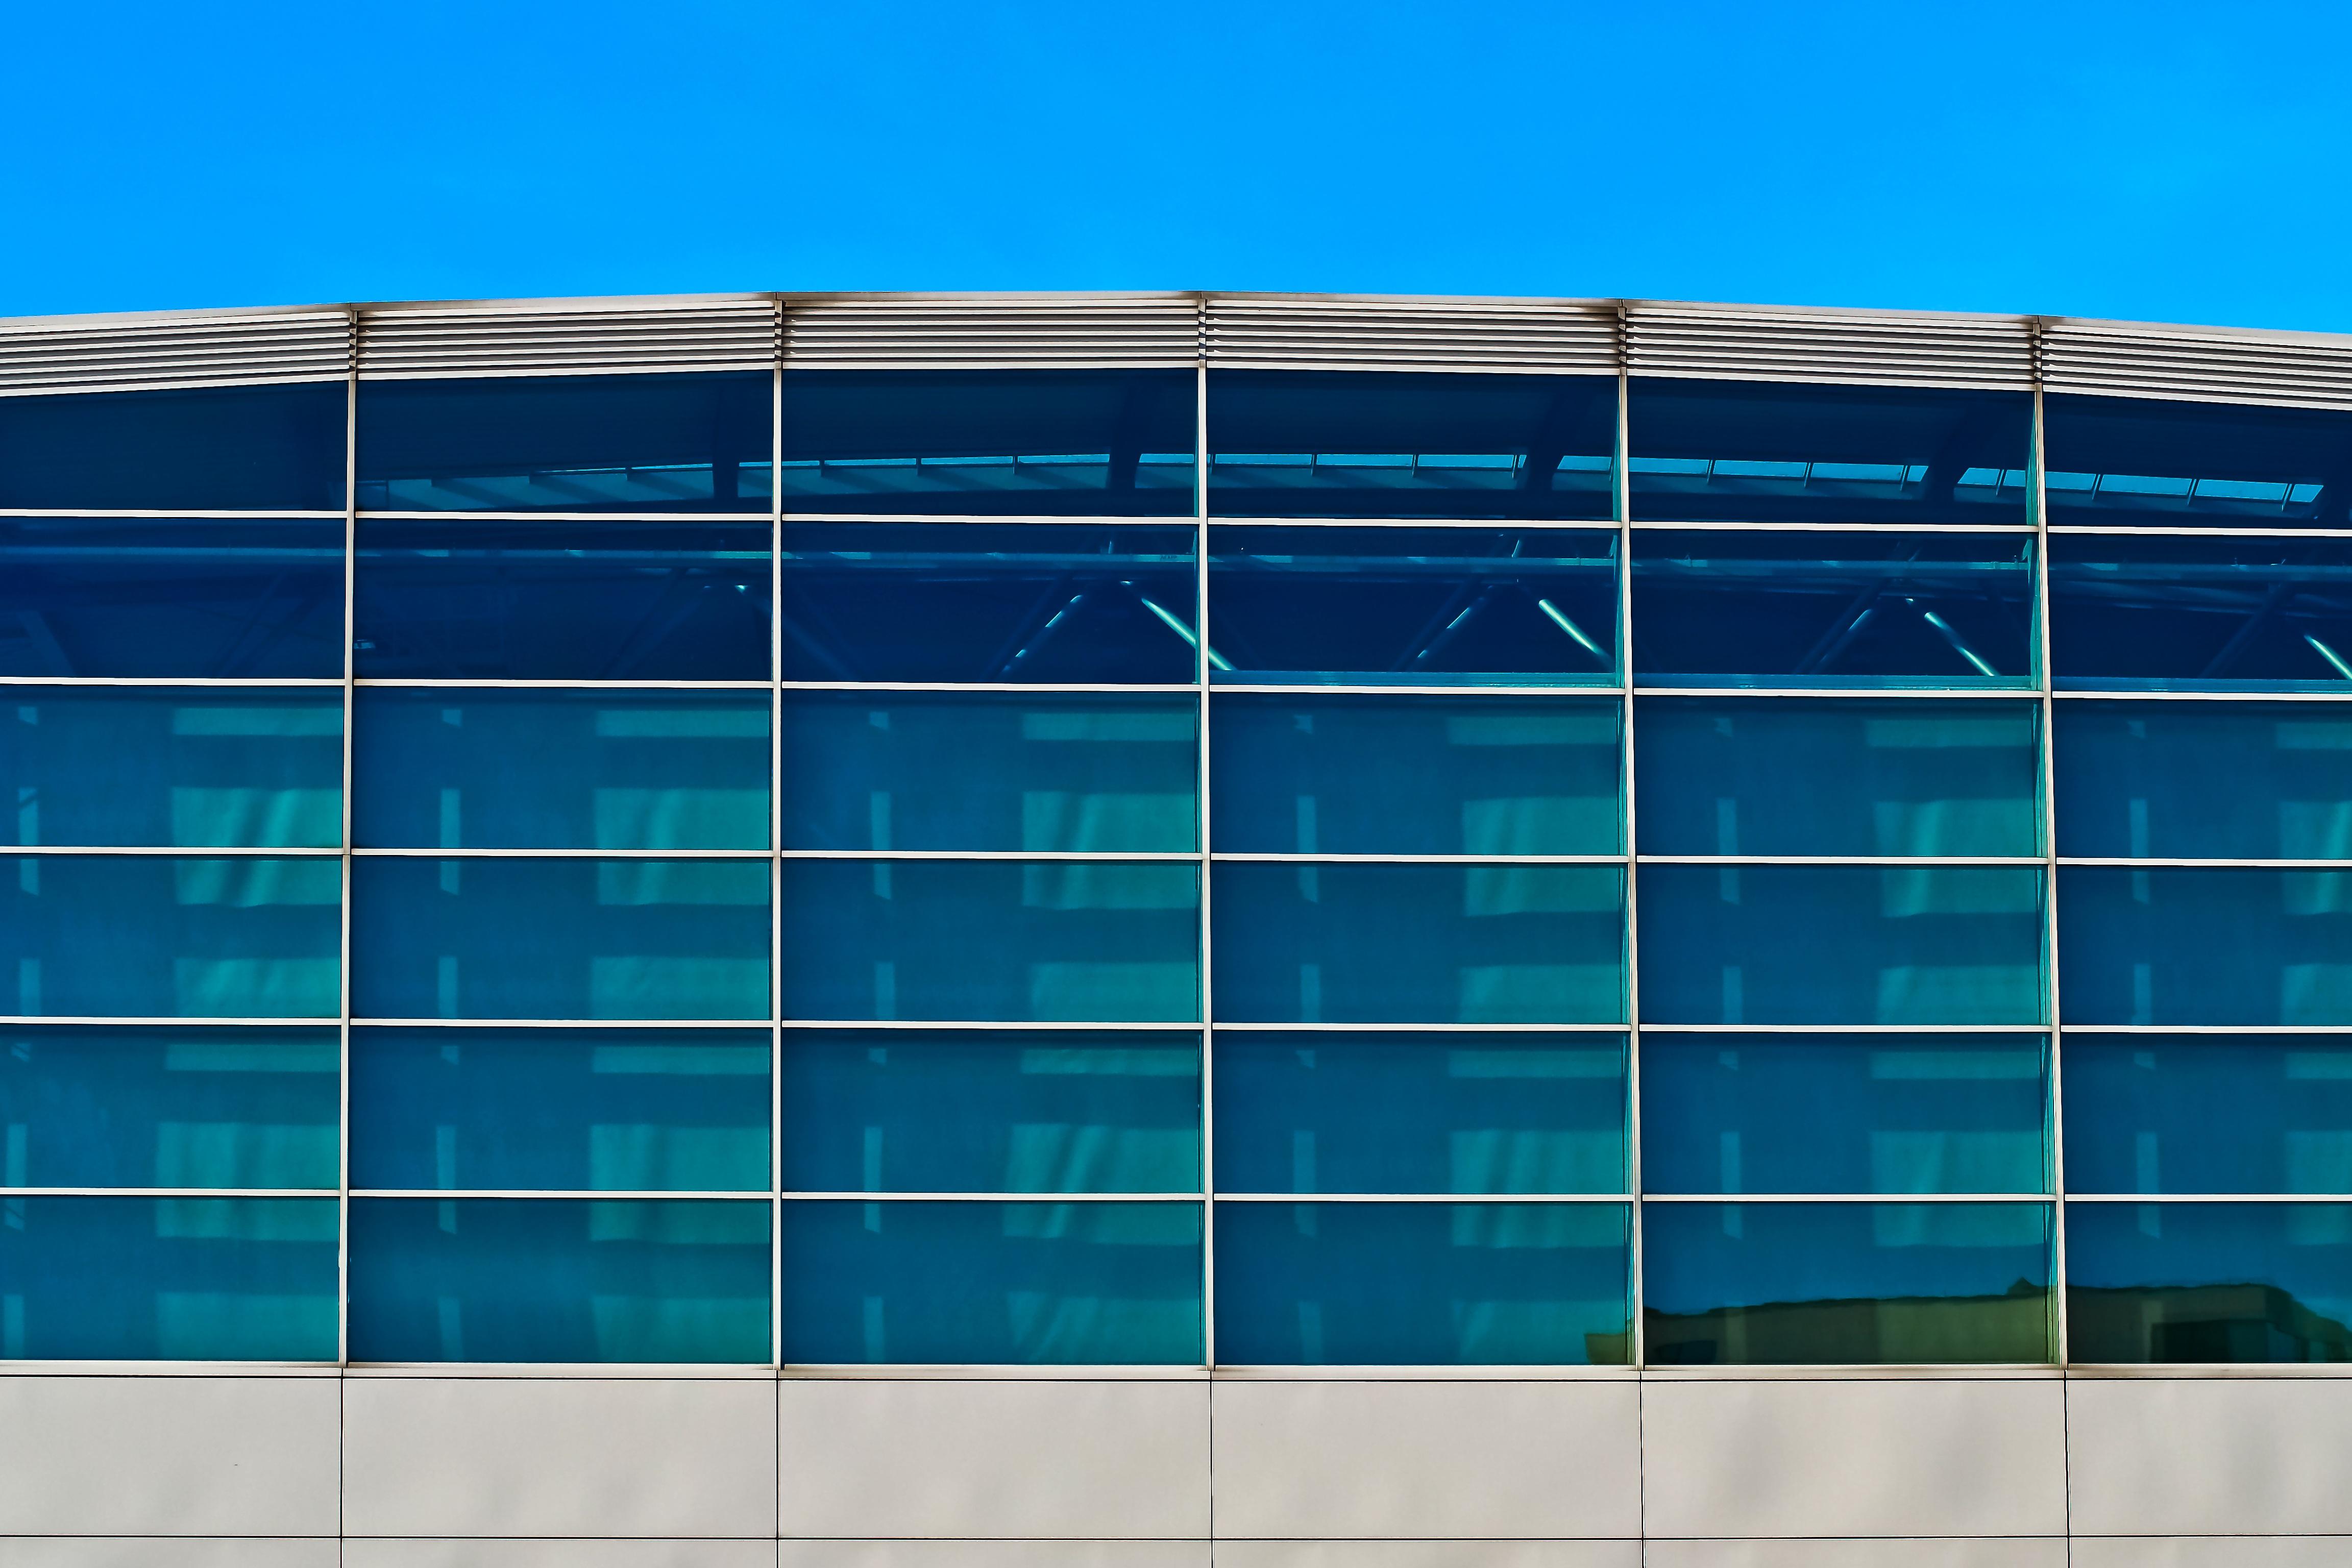 Reflective Design On Building